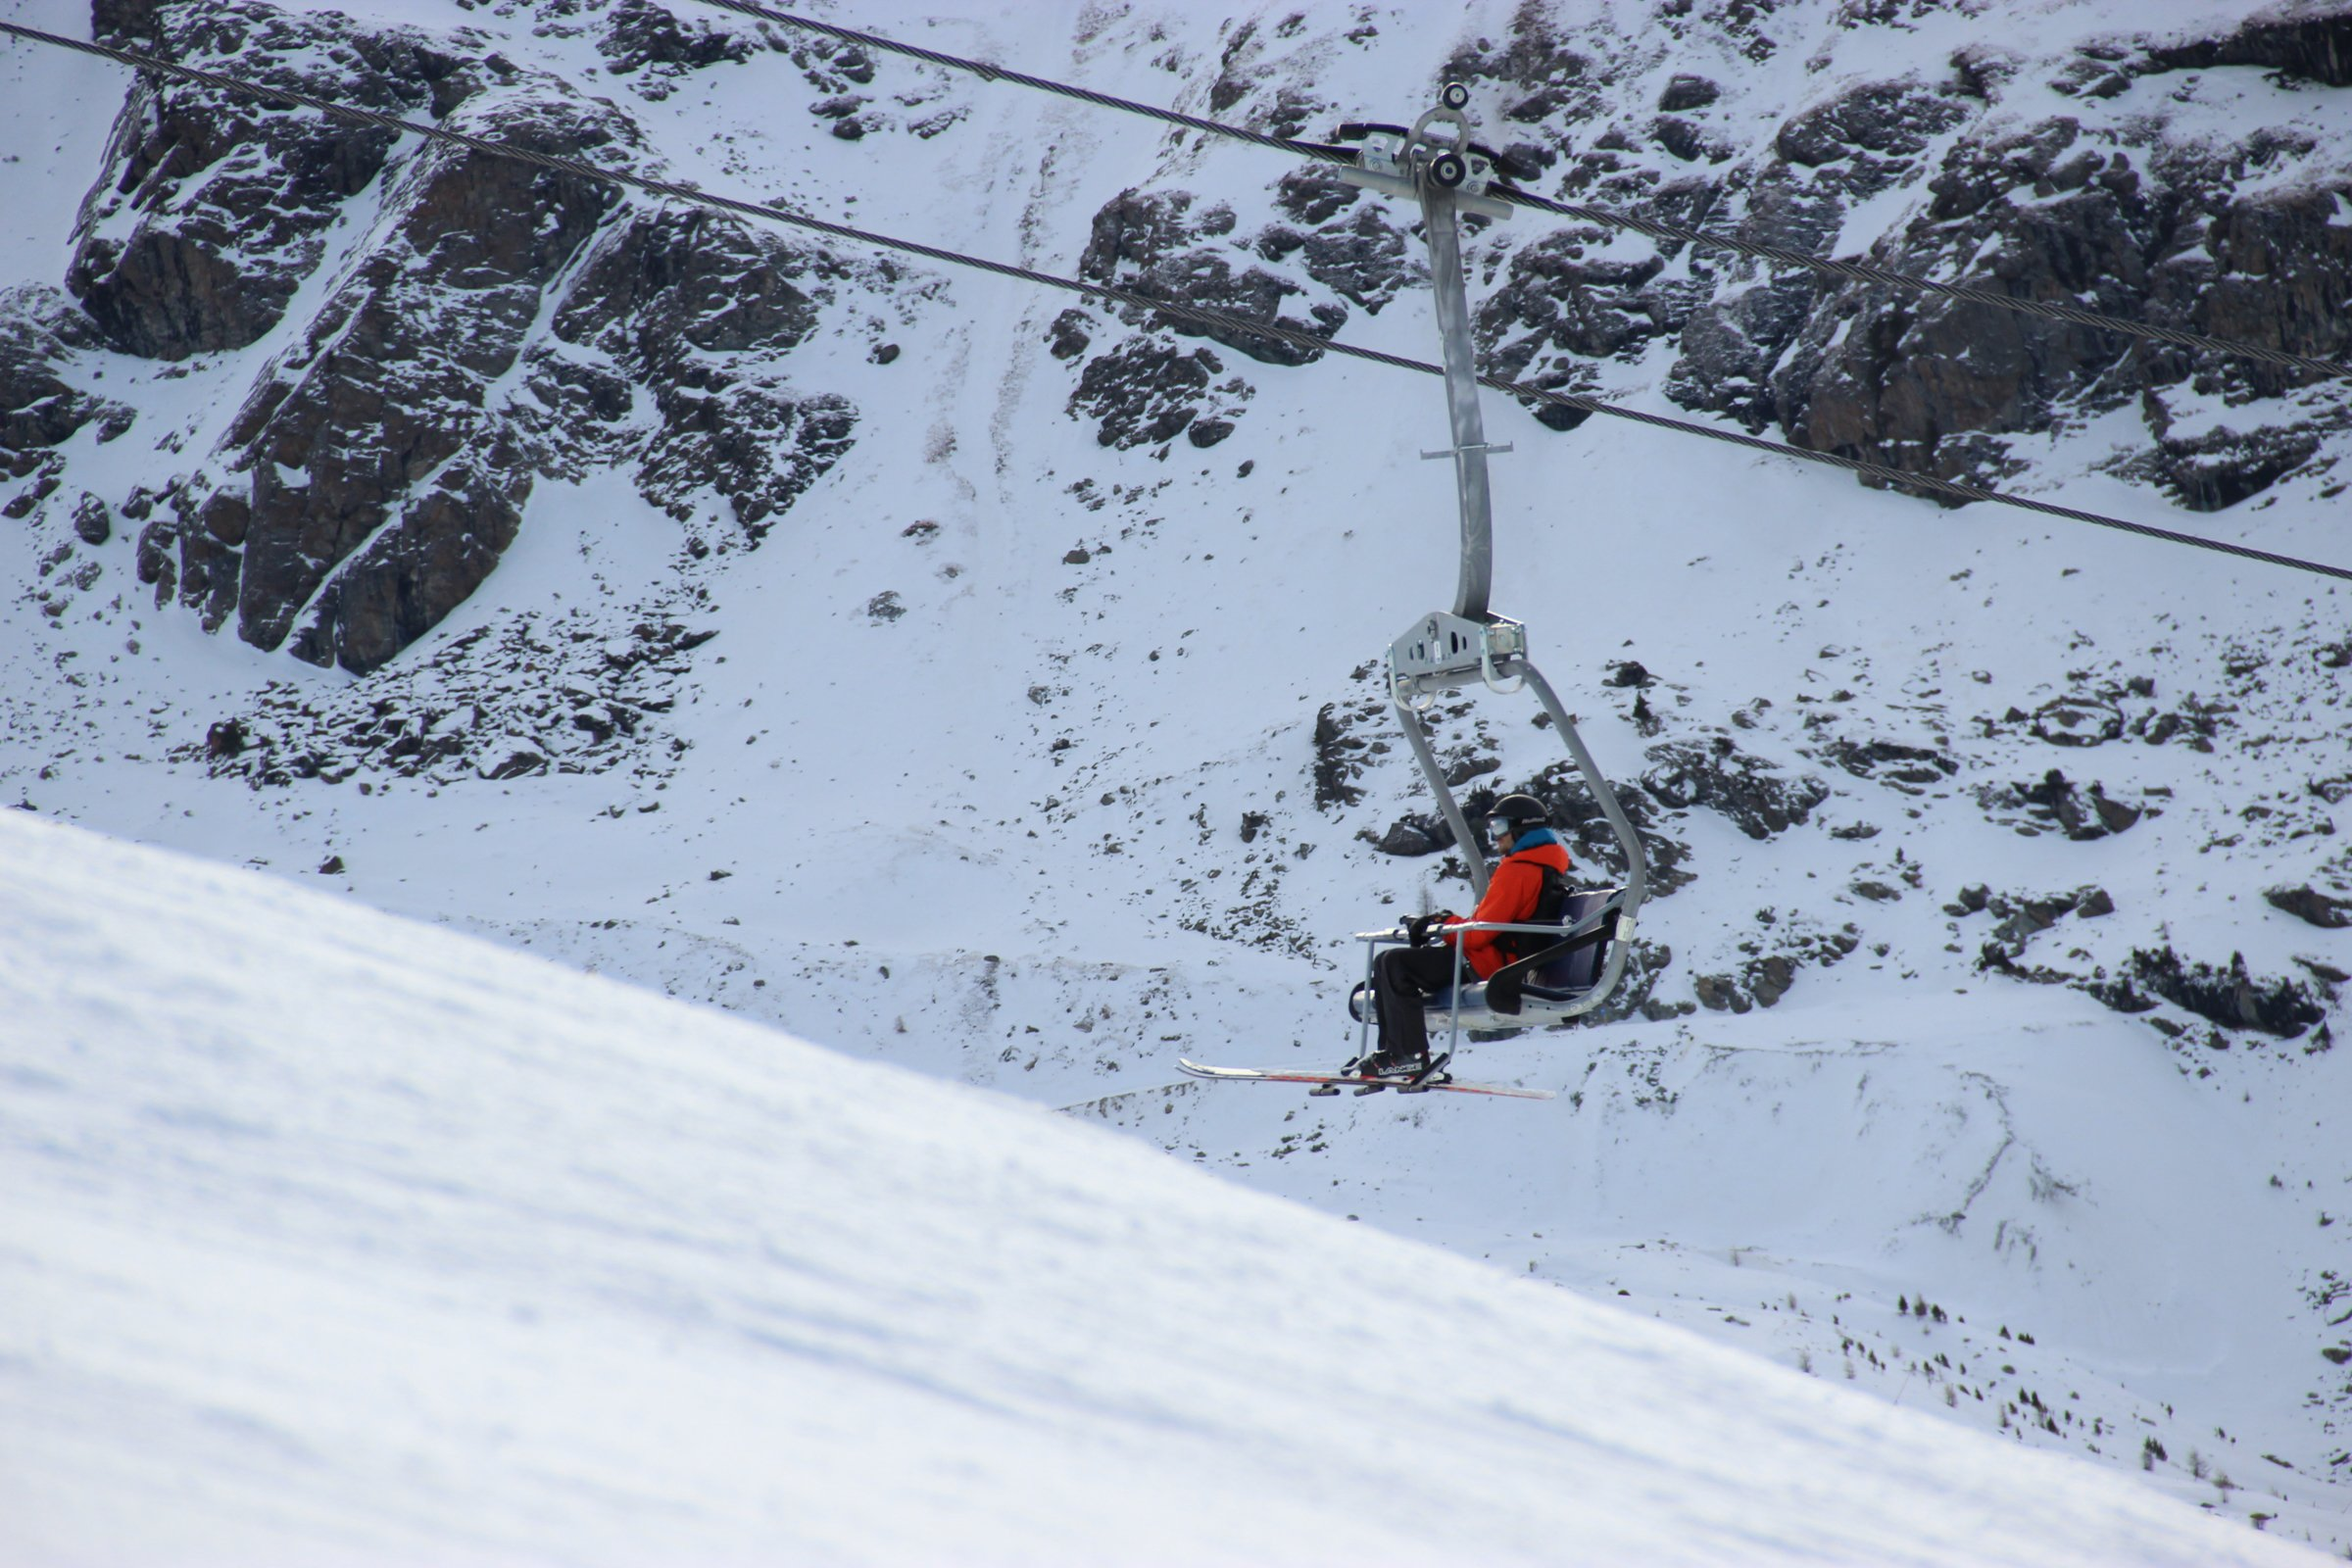 Man Riding on Ski Lift